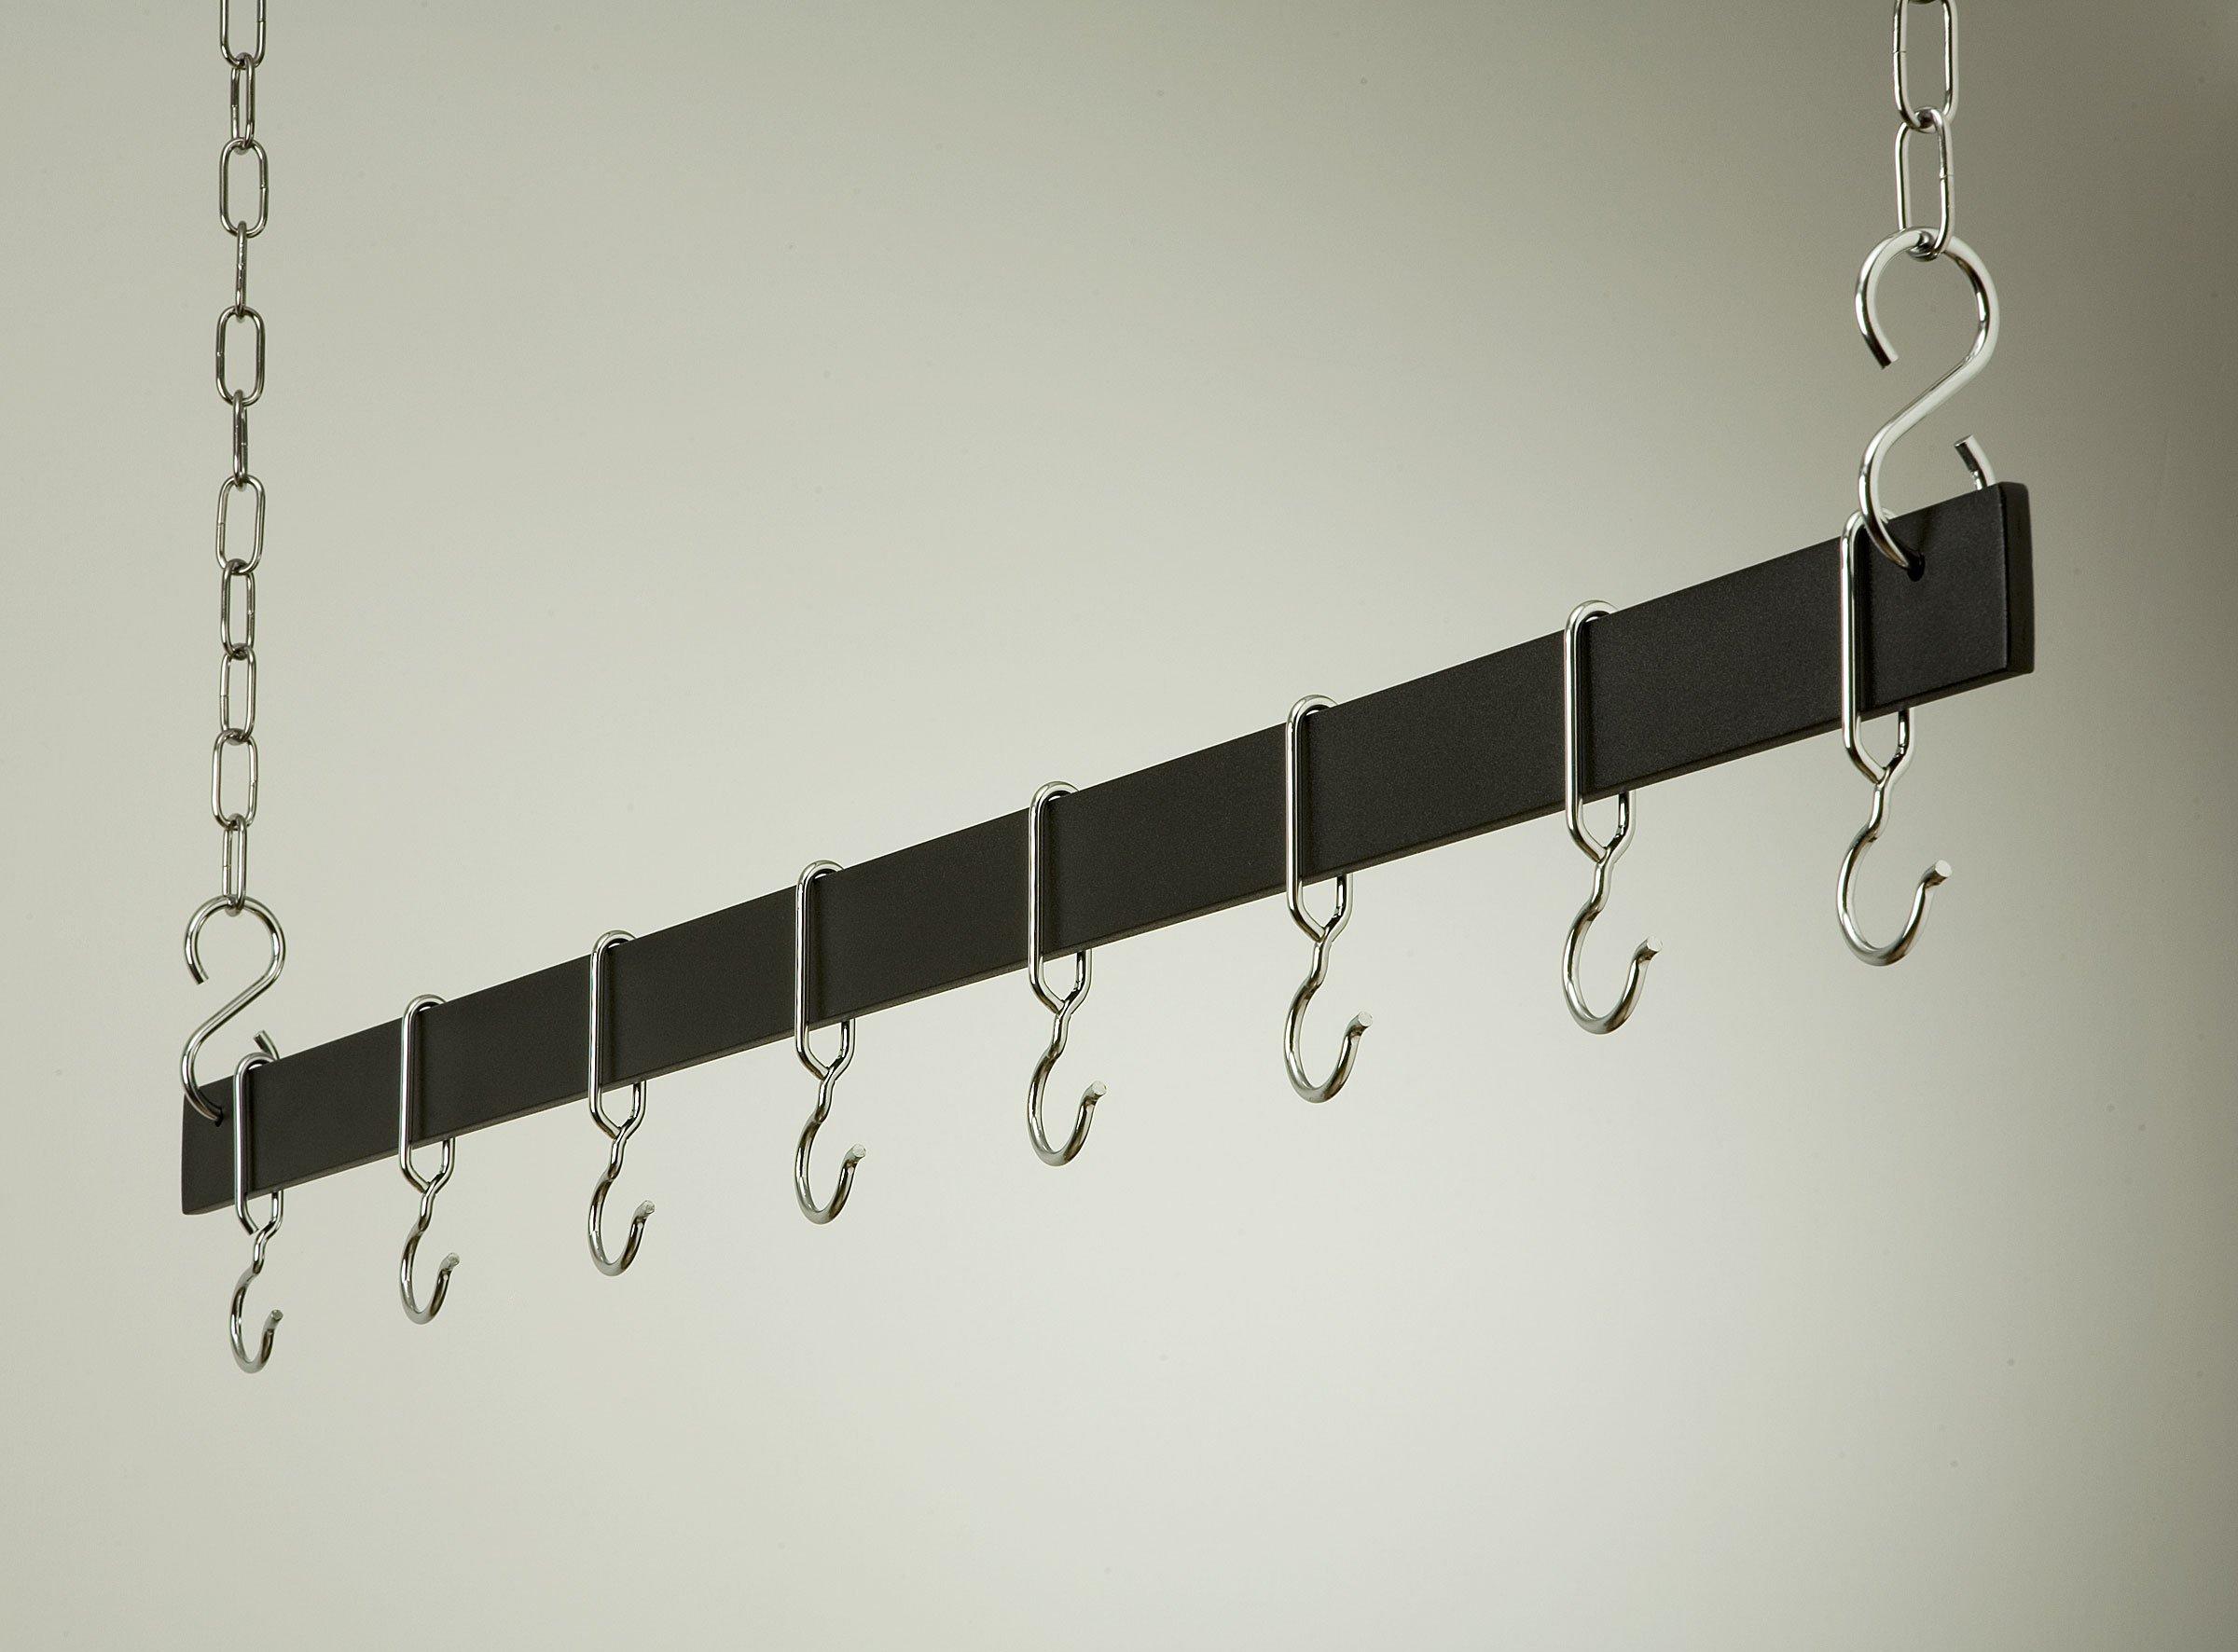 Hanging Bar Rack in Black w Chrome (54 in.)